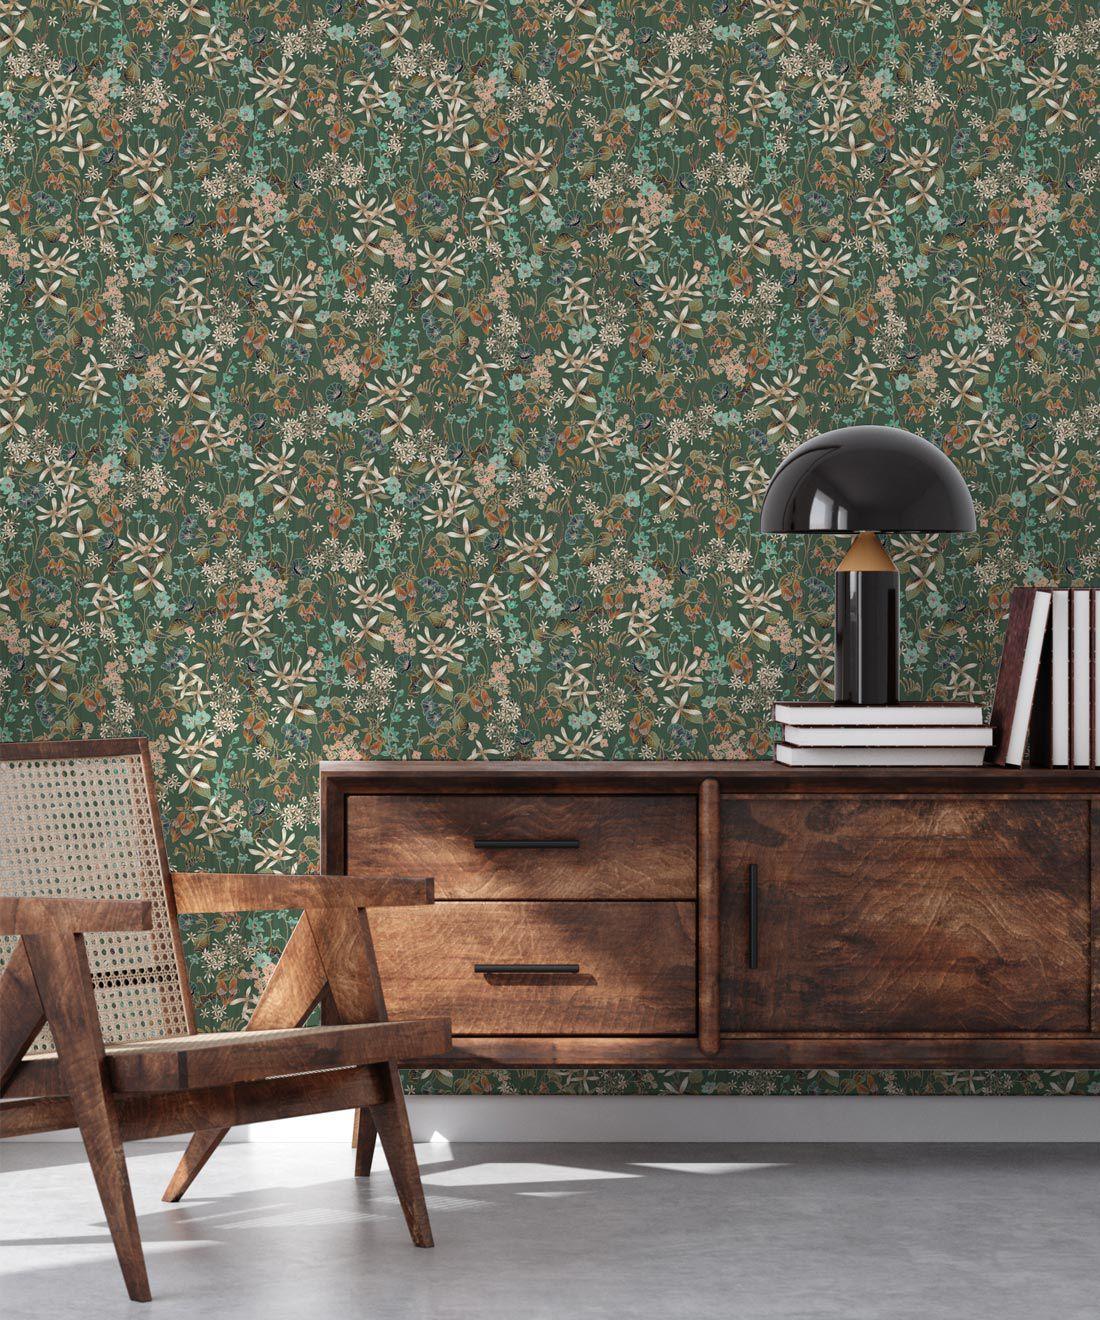 County Flowers Wallpaper • Eloise Short • Vintage Floral Wallpaper •Granny Chic Wallpaper • Grandmillennial Style Wallpaper •Avocado •Insitu